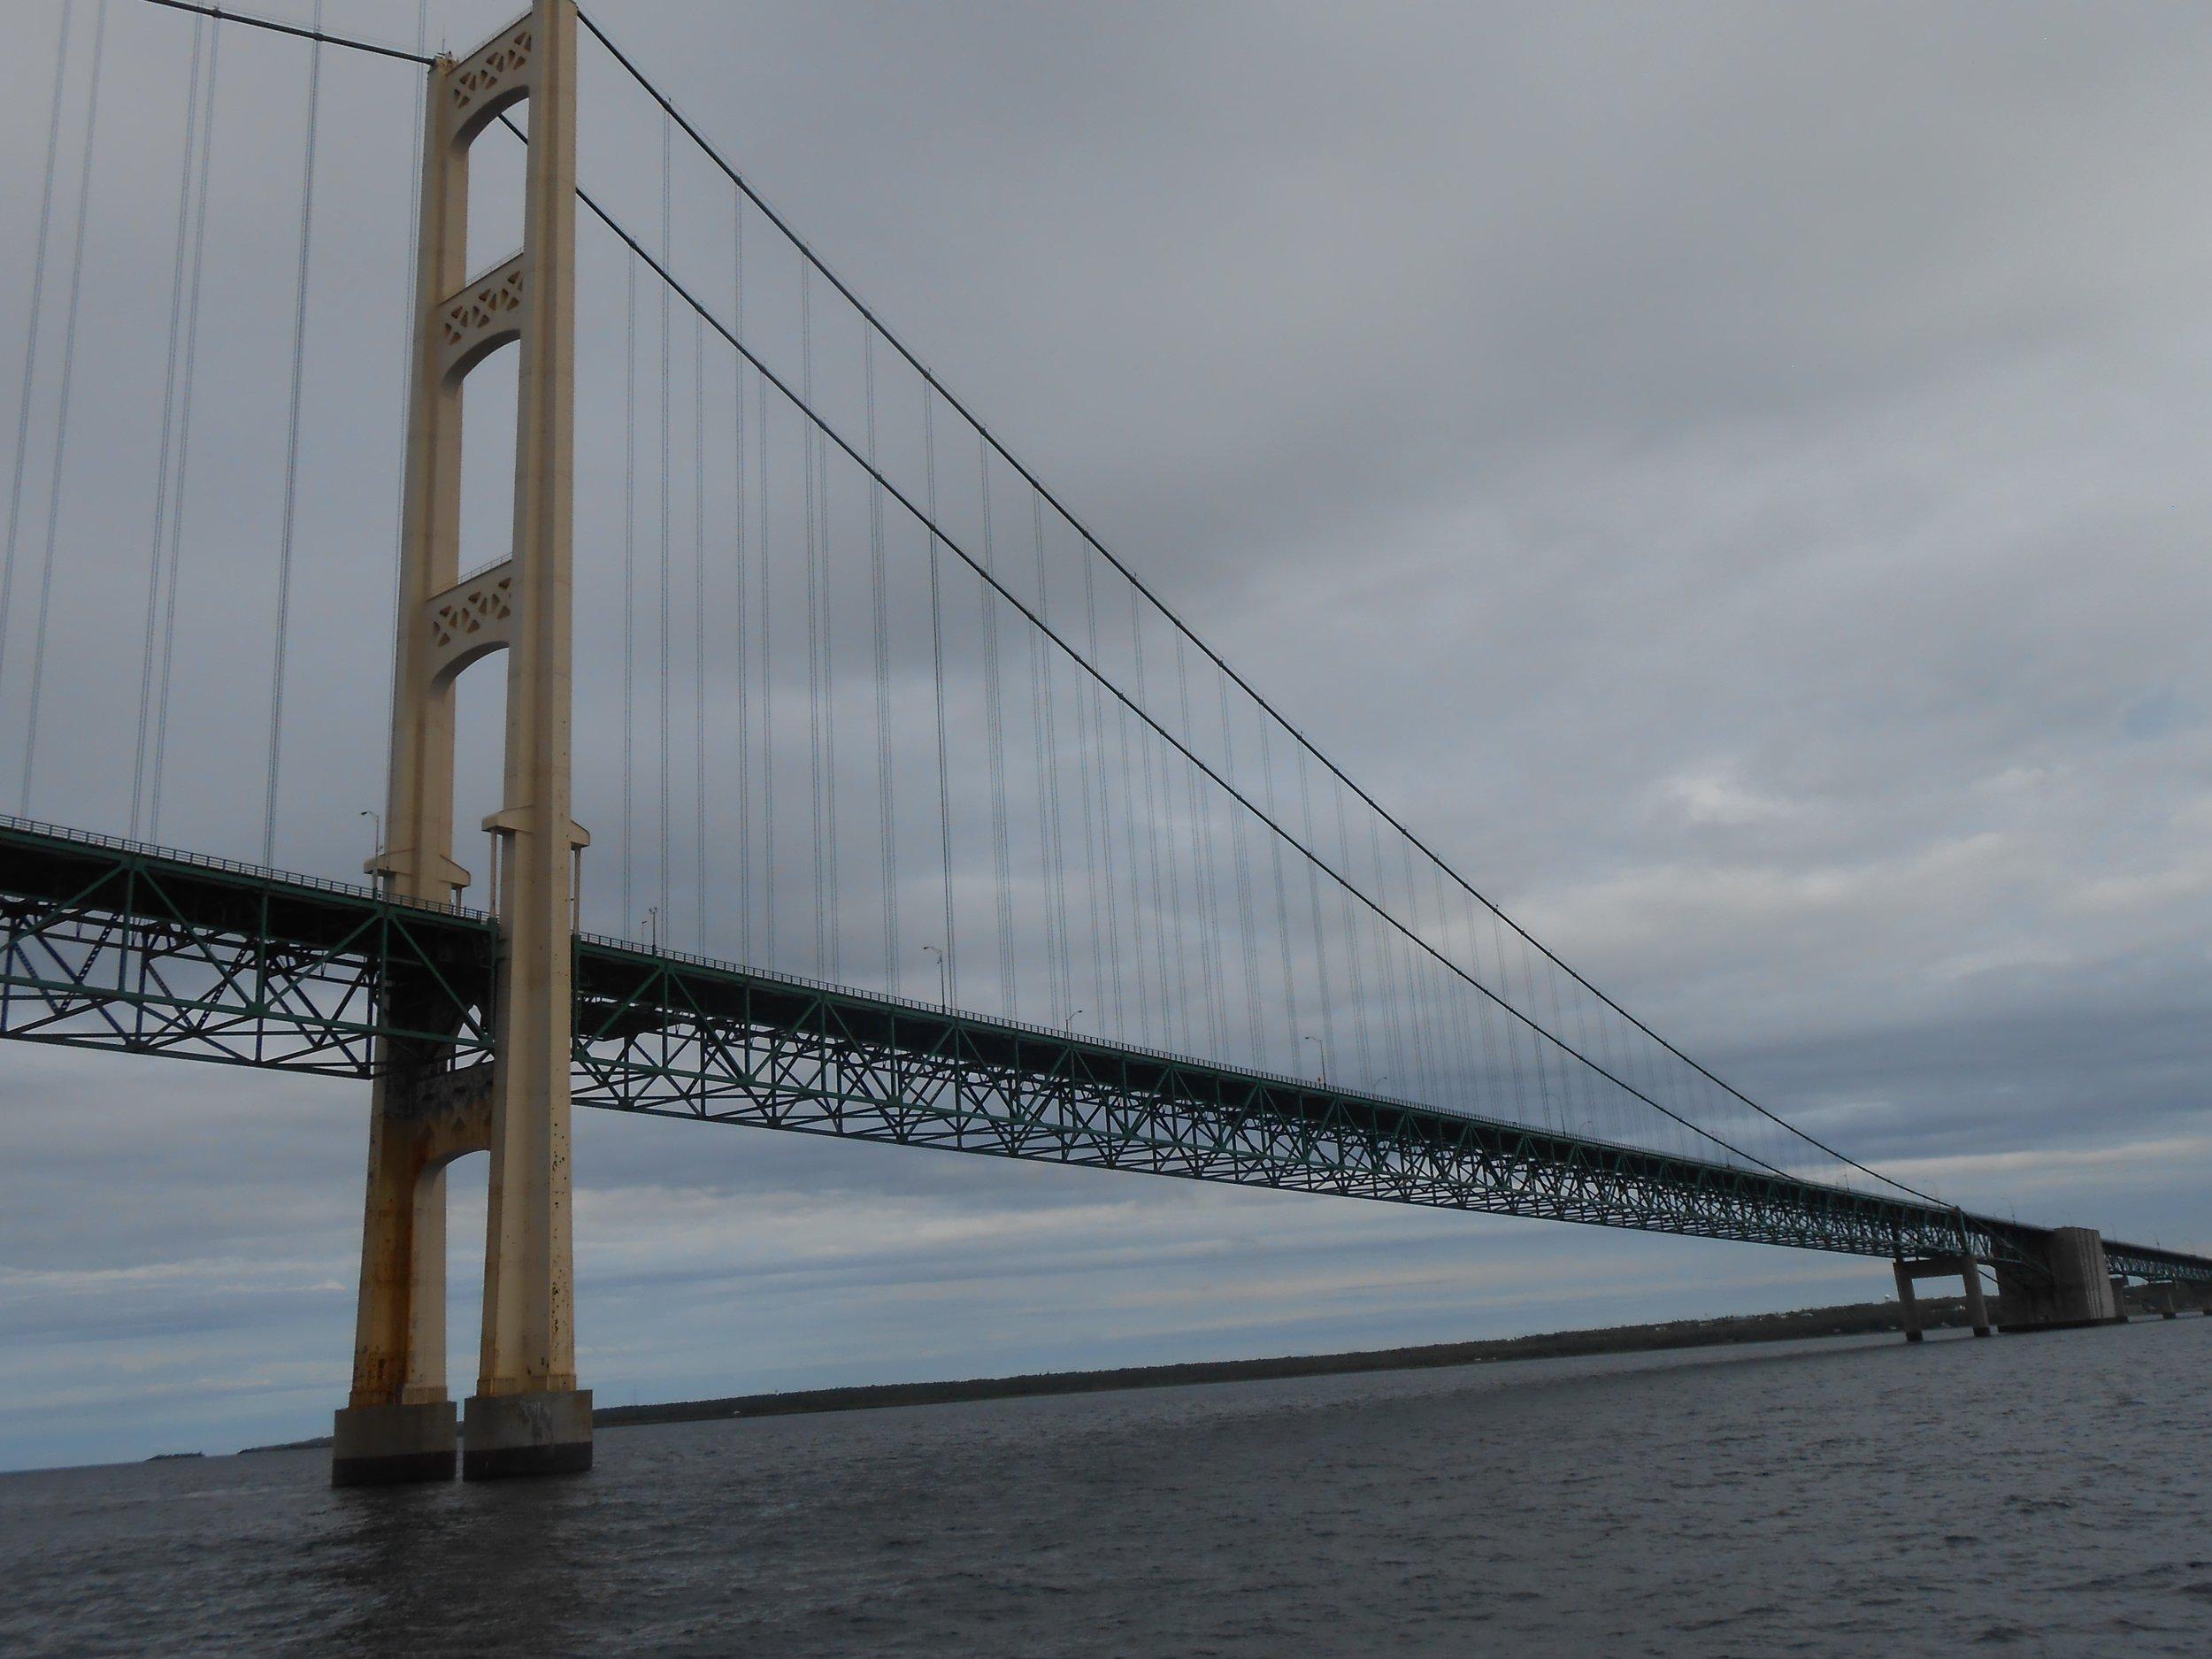 Mackinac Bridge connecting Michigan's Two peninsulas